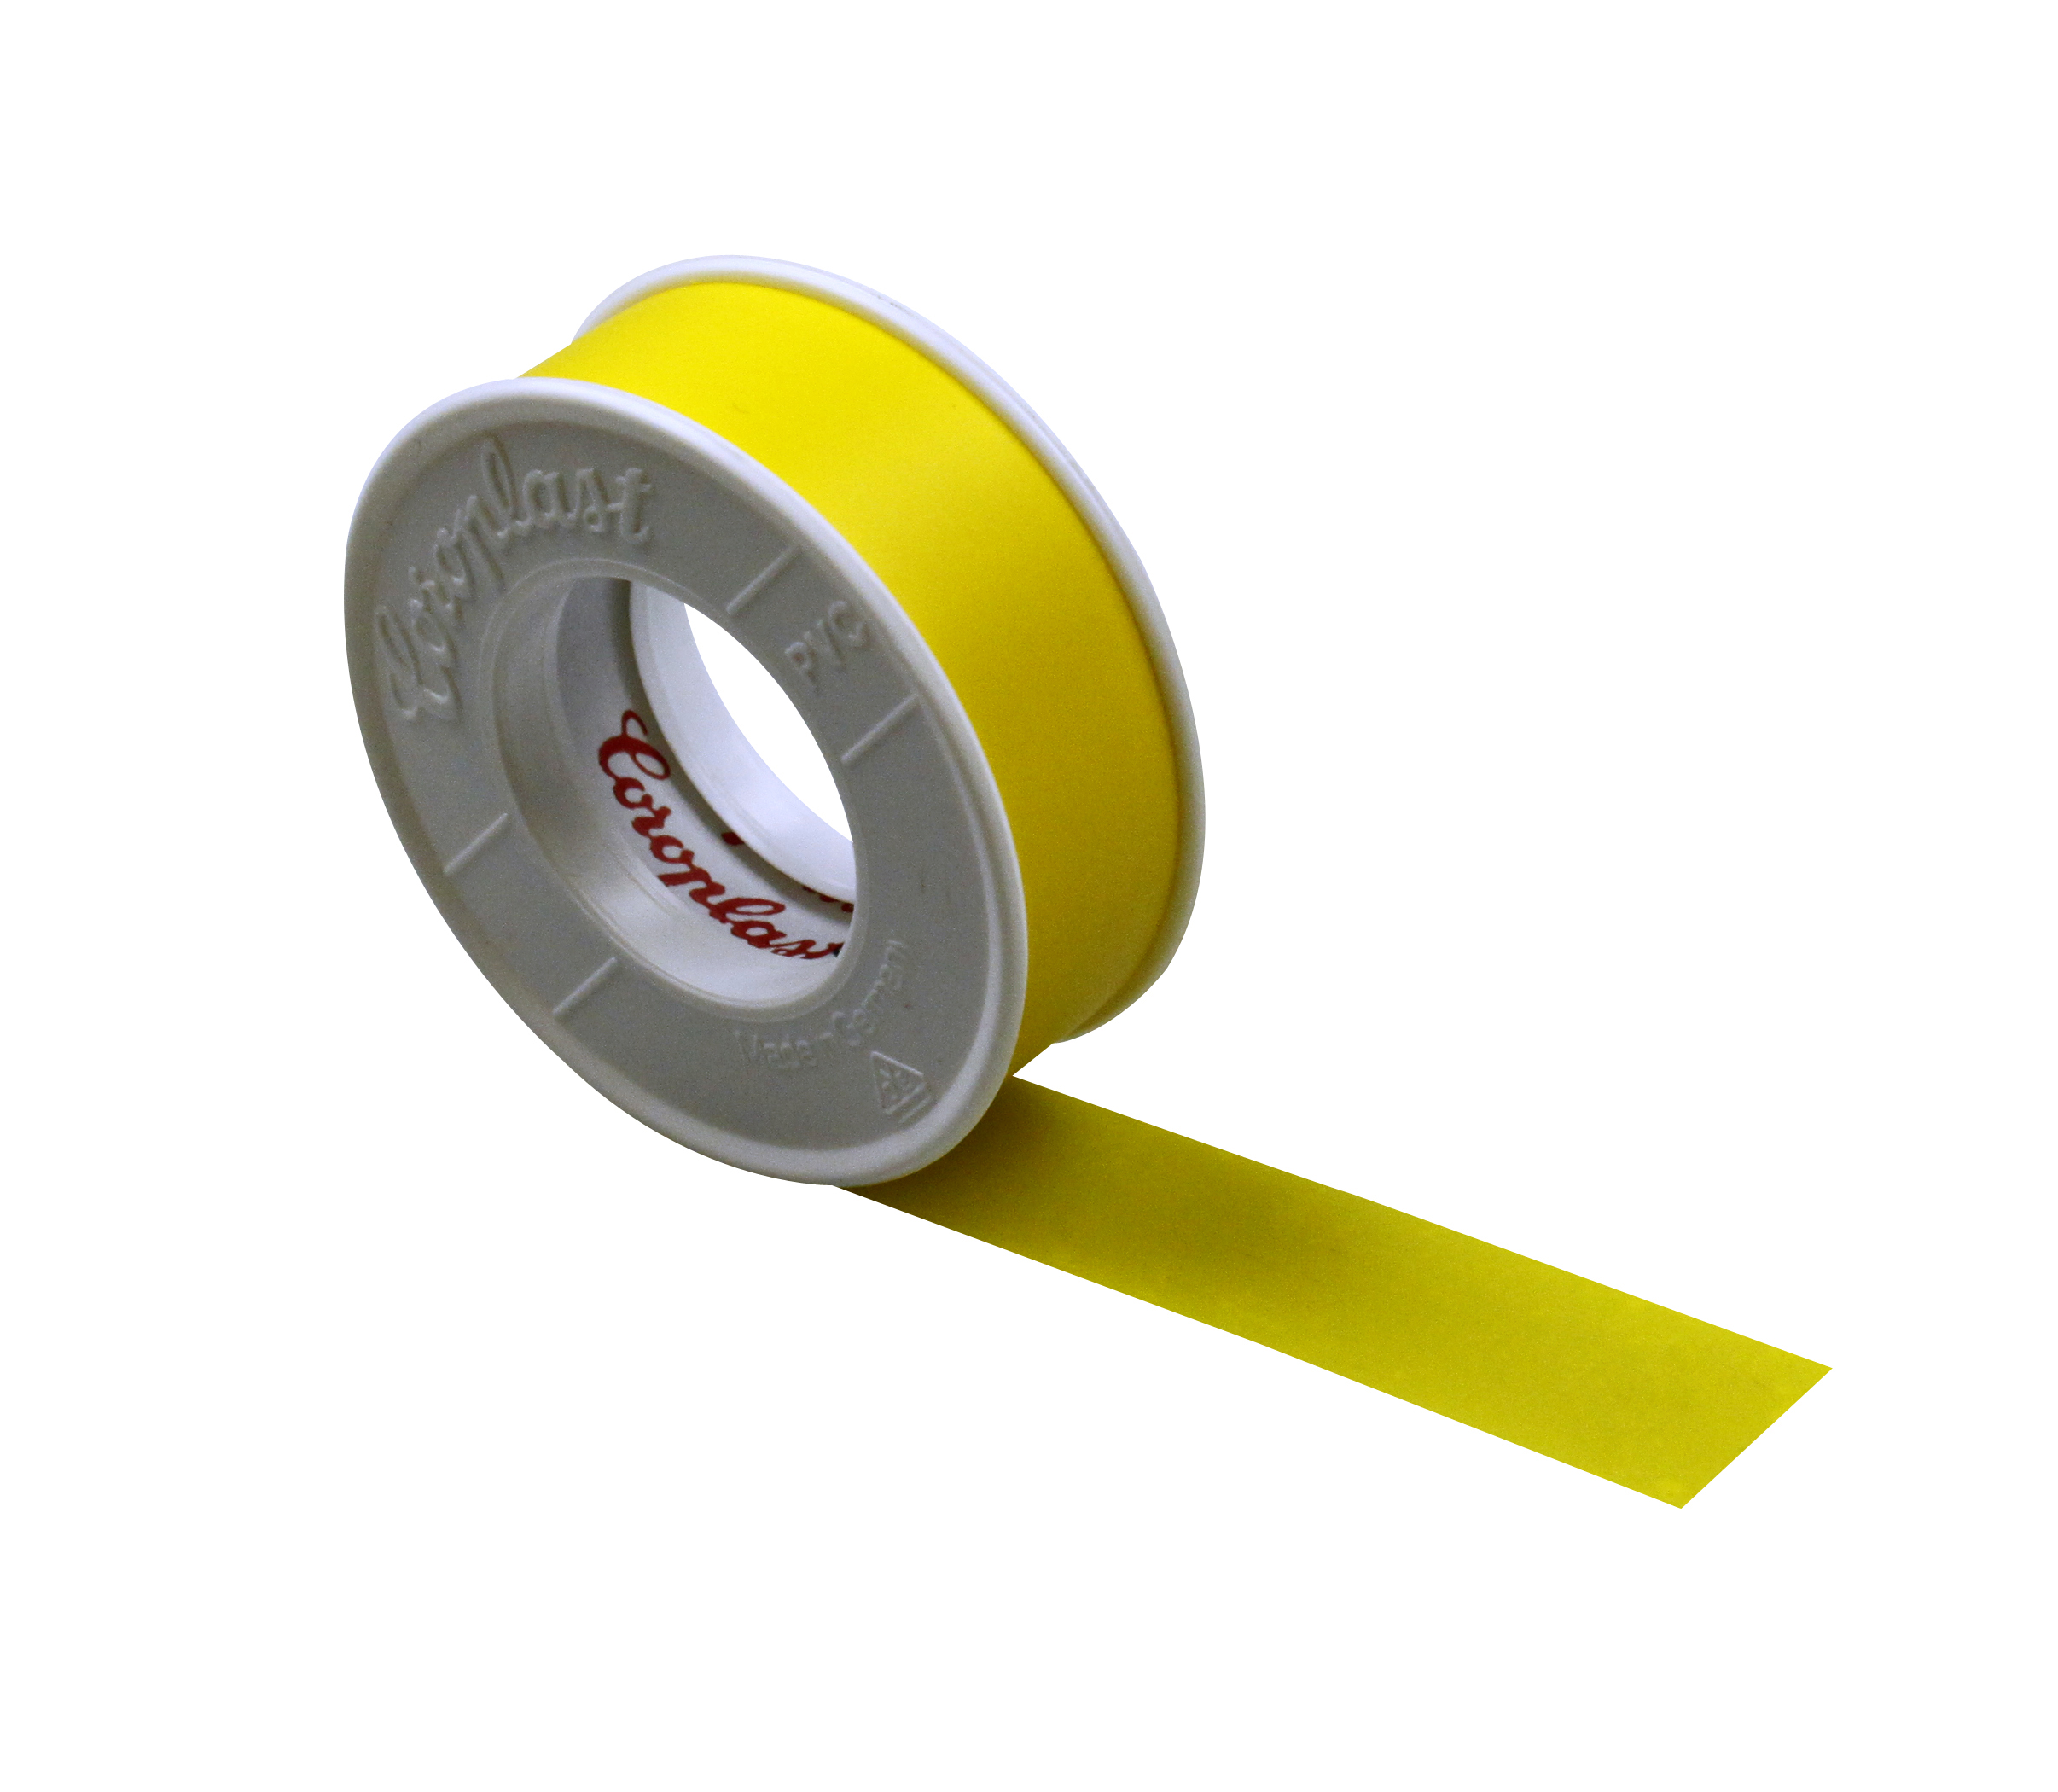 1 Stk Isolierband gelb 15mm x 10m-Coroplast GI98540902